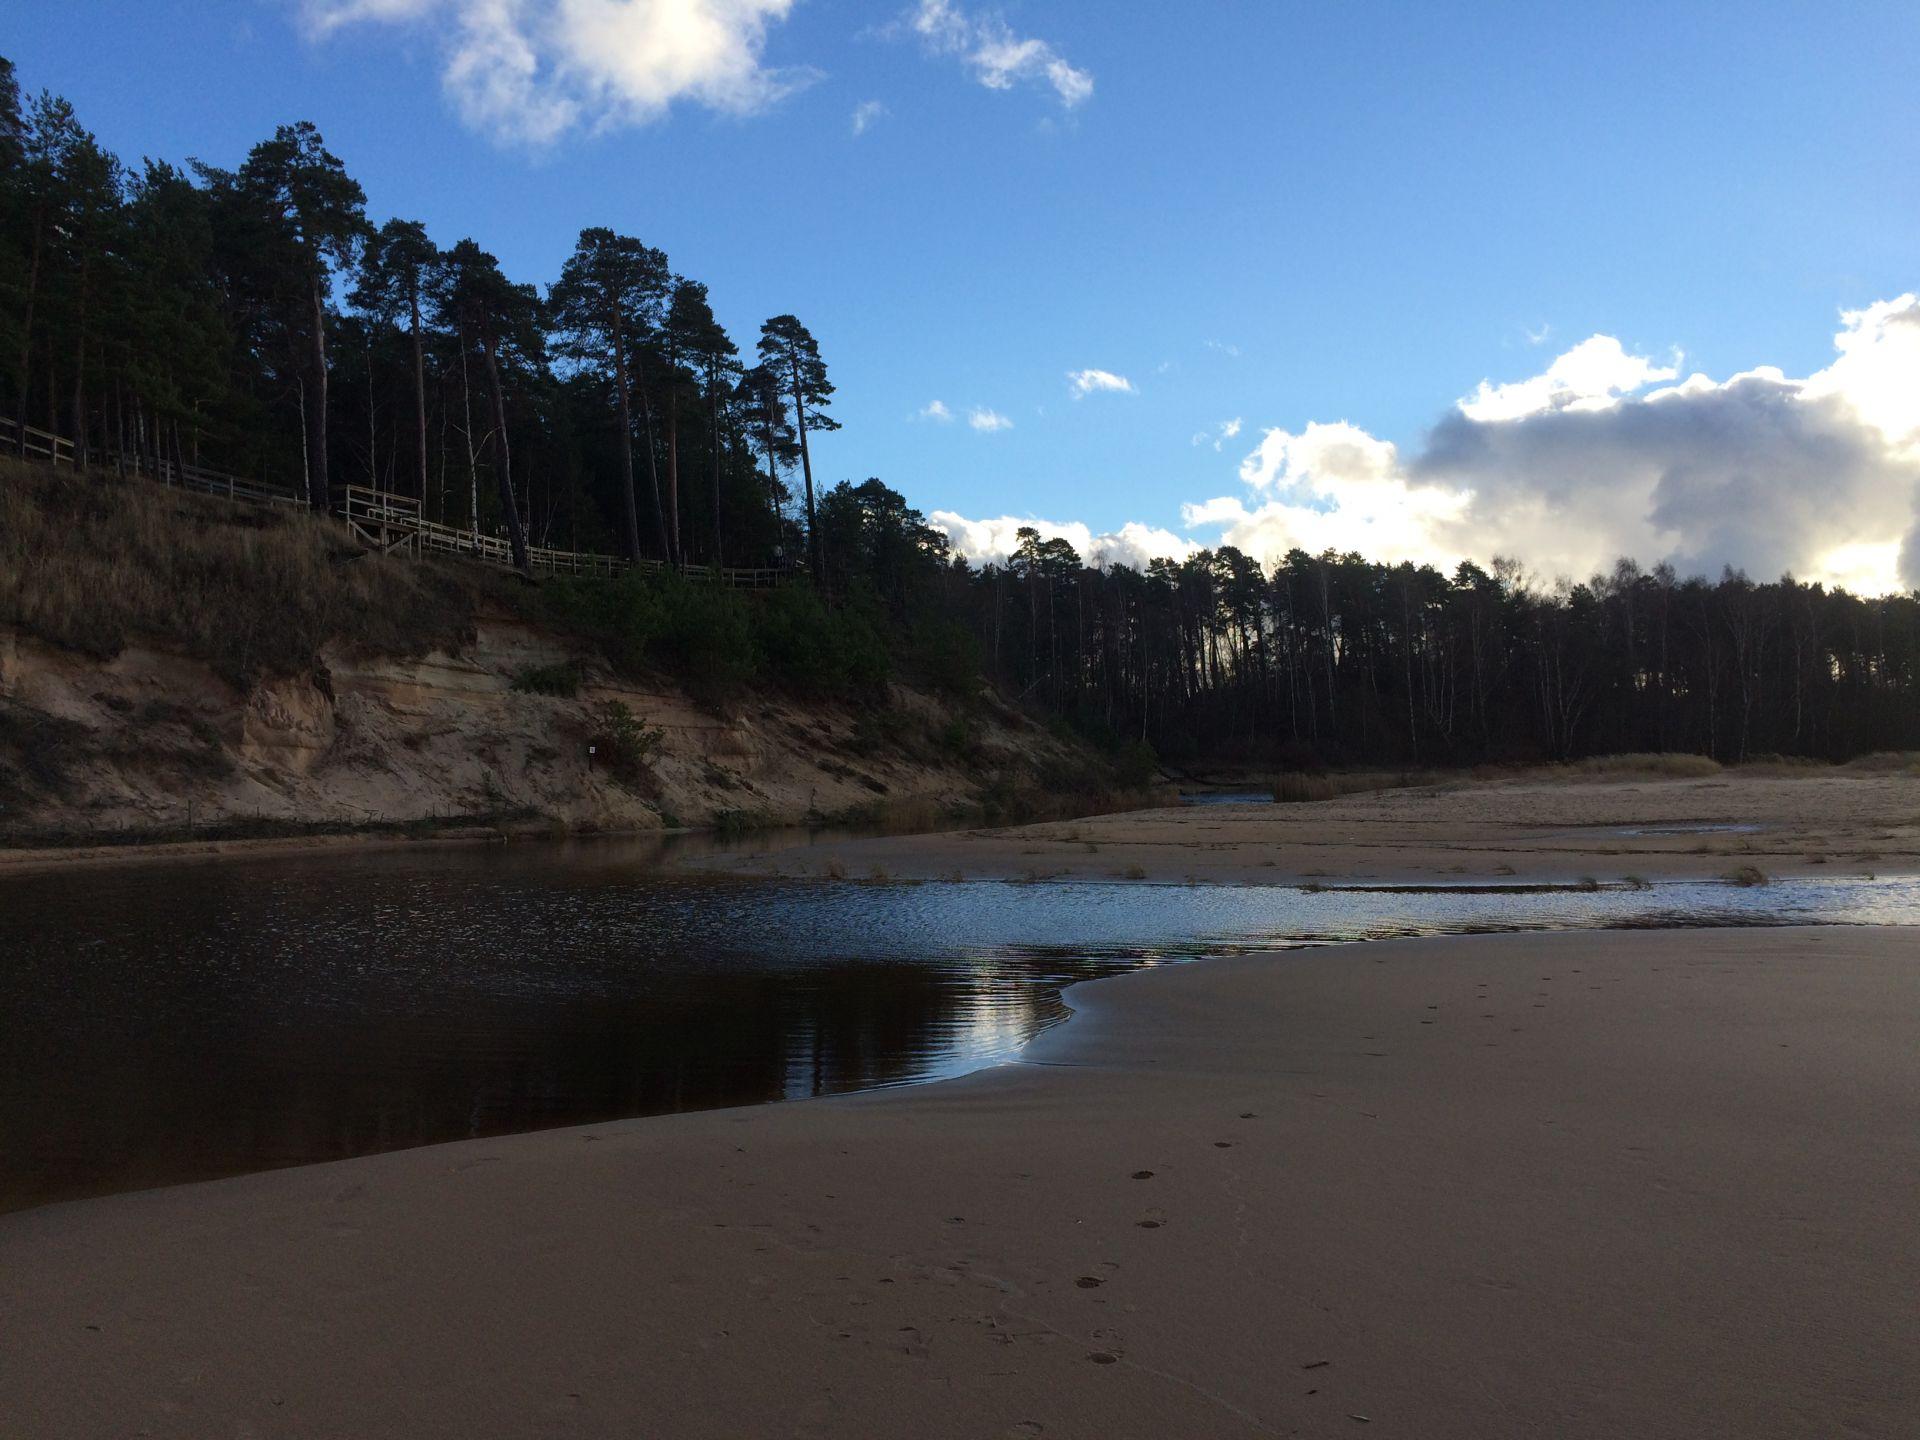 Saulkrasti beach